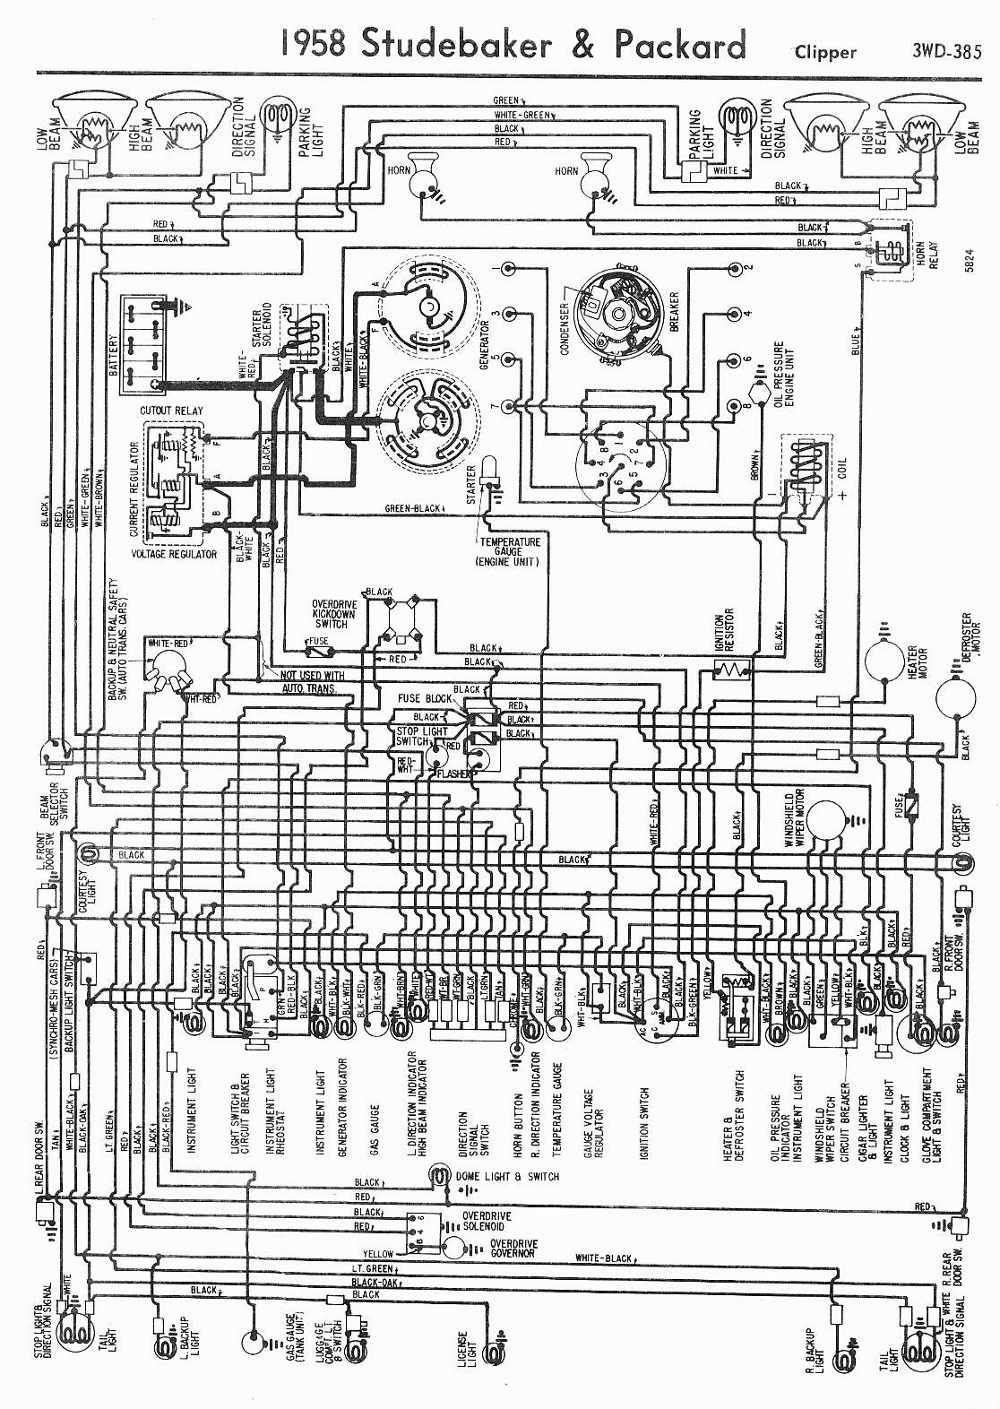 small resolution of 1950 packard wiring diagram wiring diagram for you rh 7 4 carrera rennwelt de 1952 packard 1948 packard